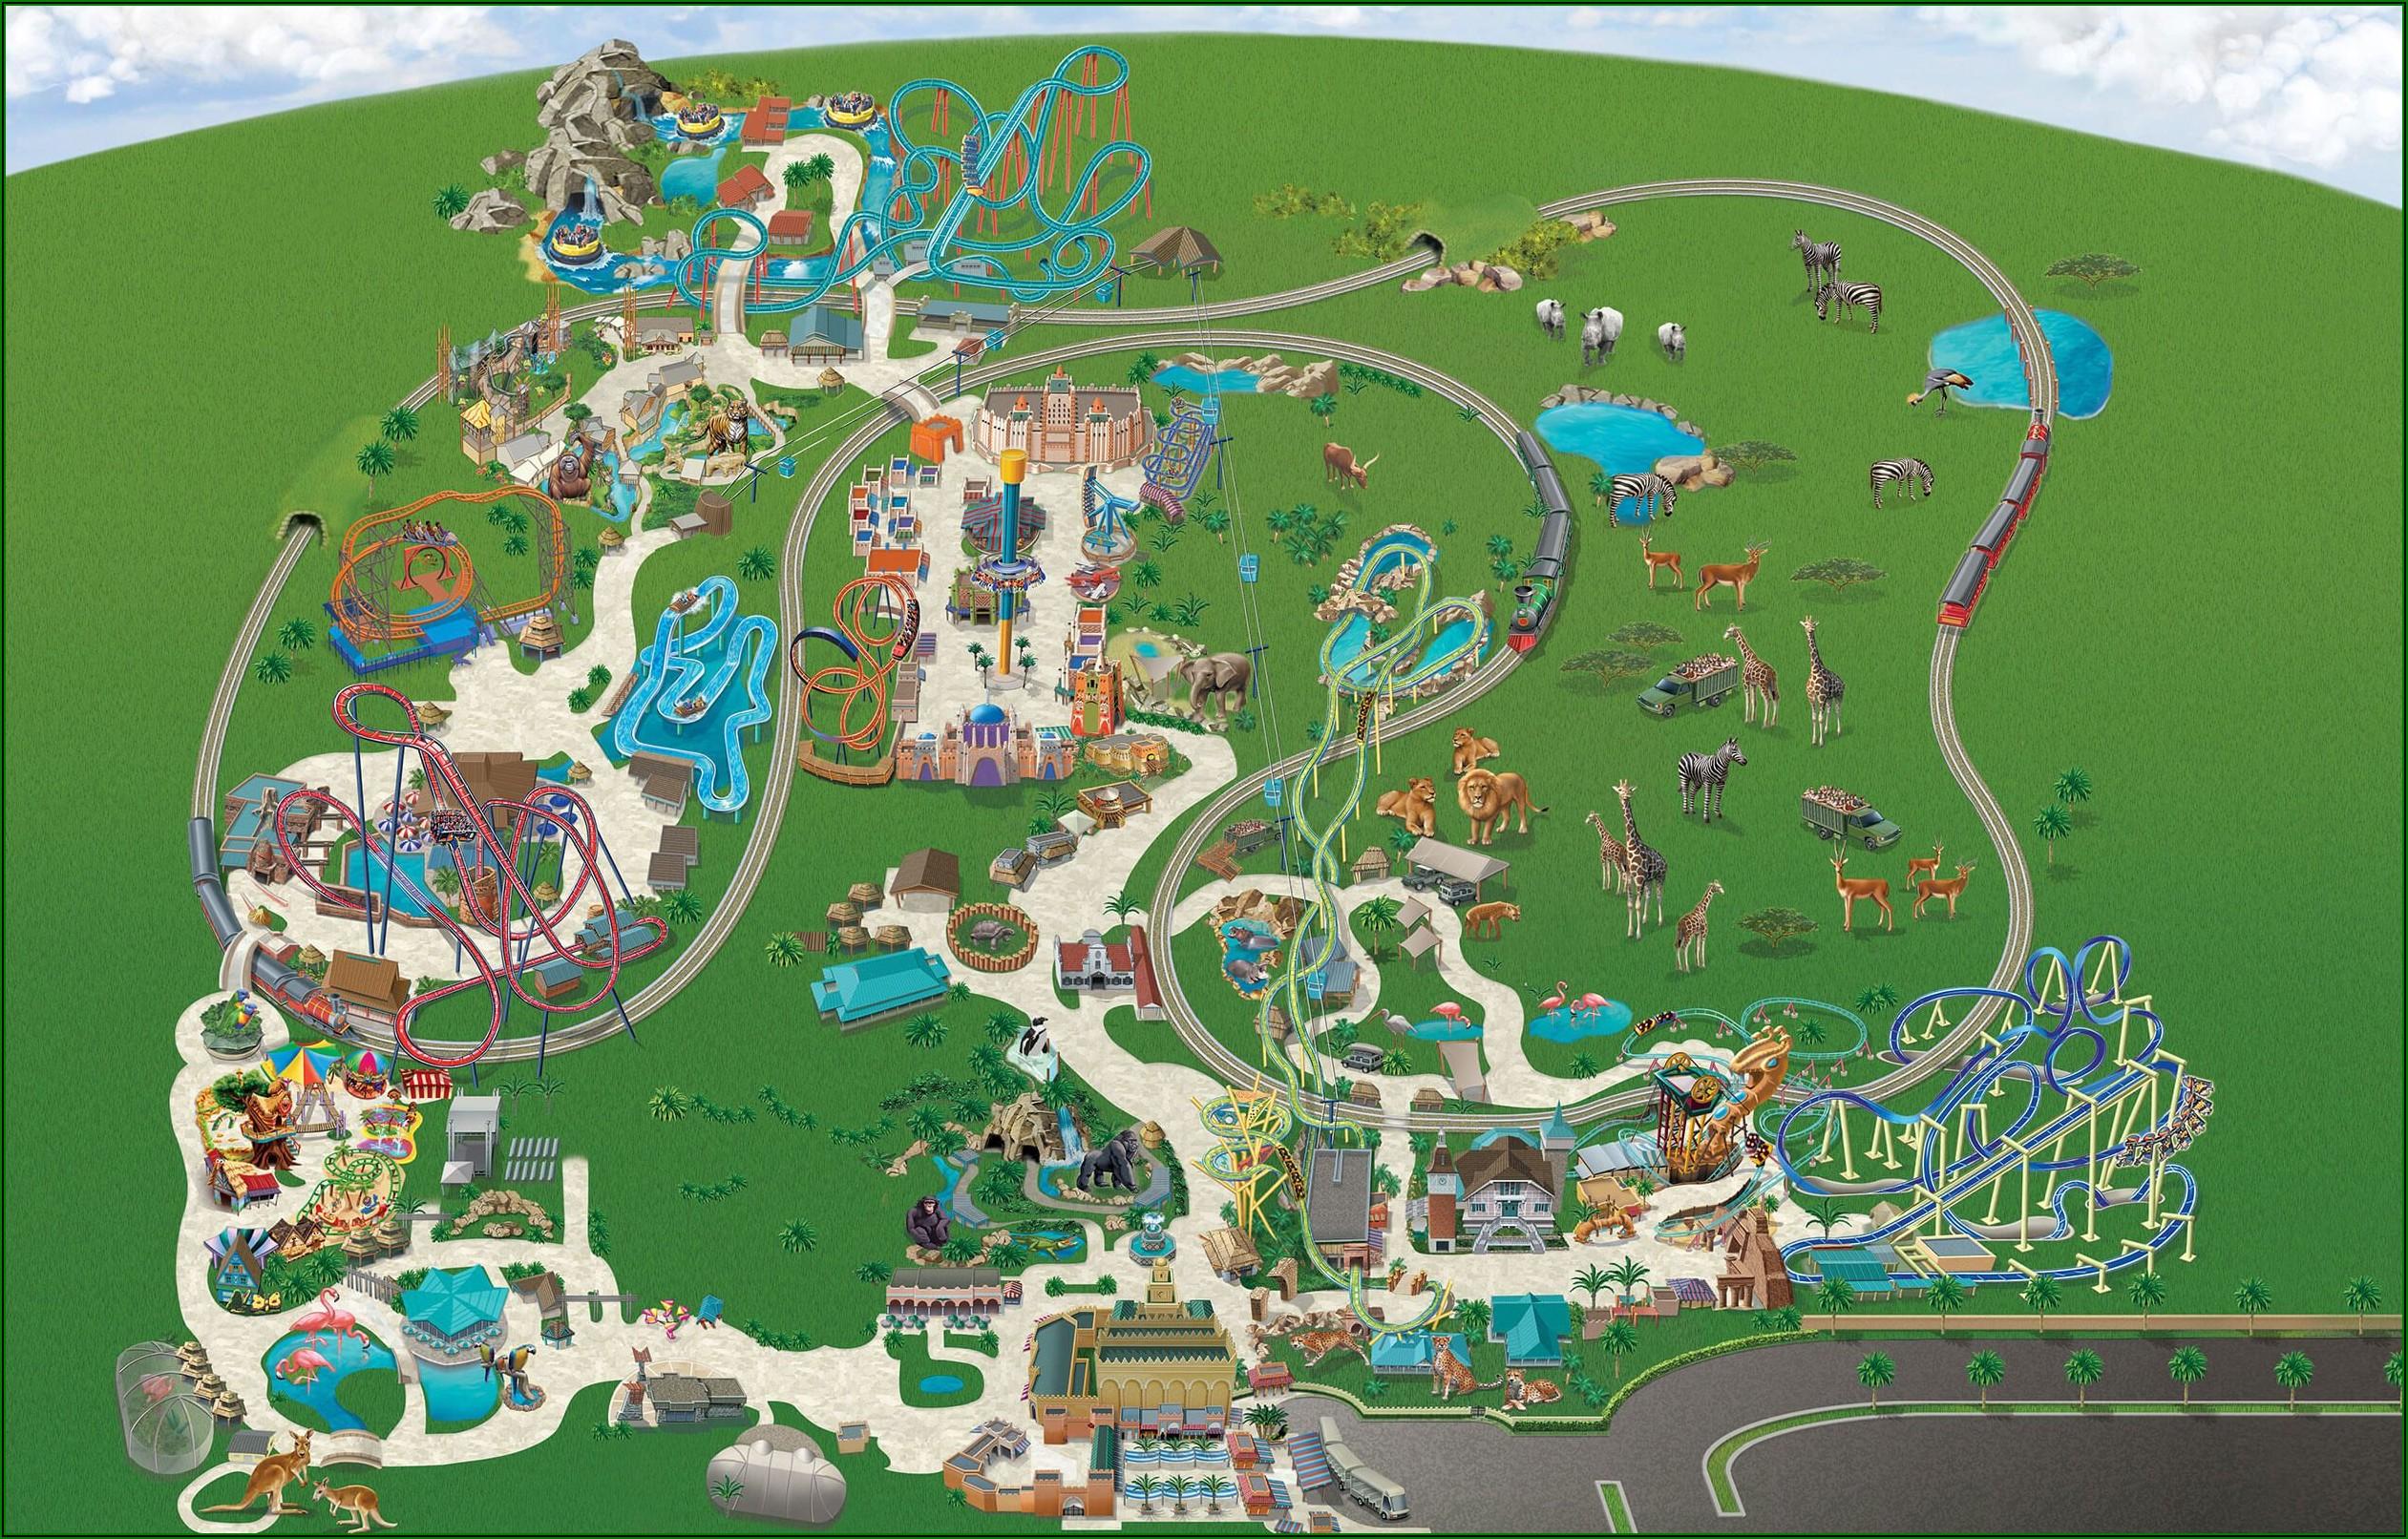 Busch Gardens Tampa Map Of Park